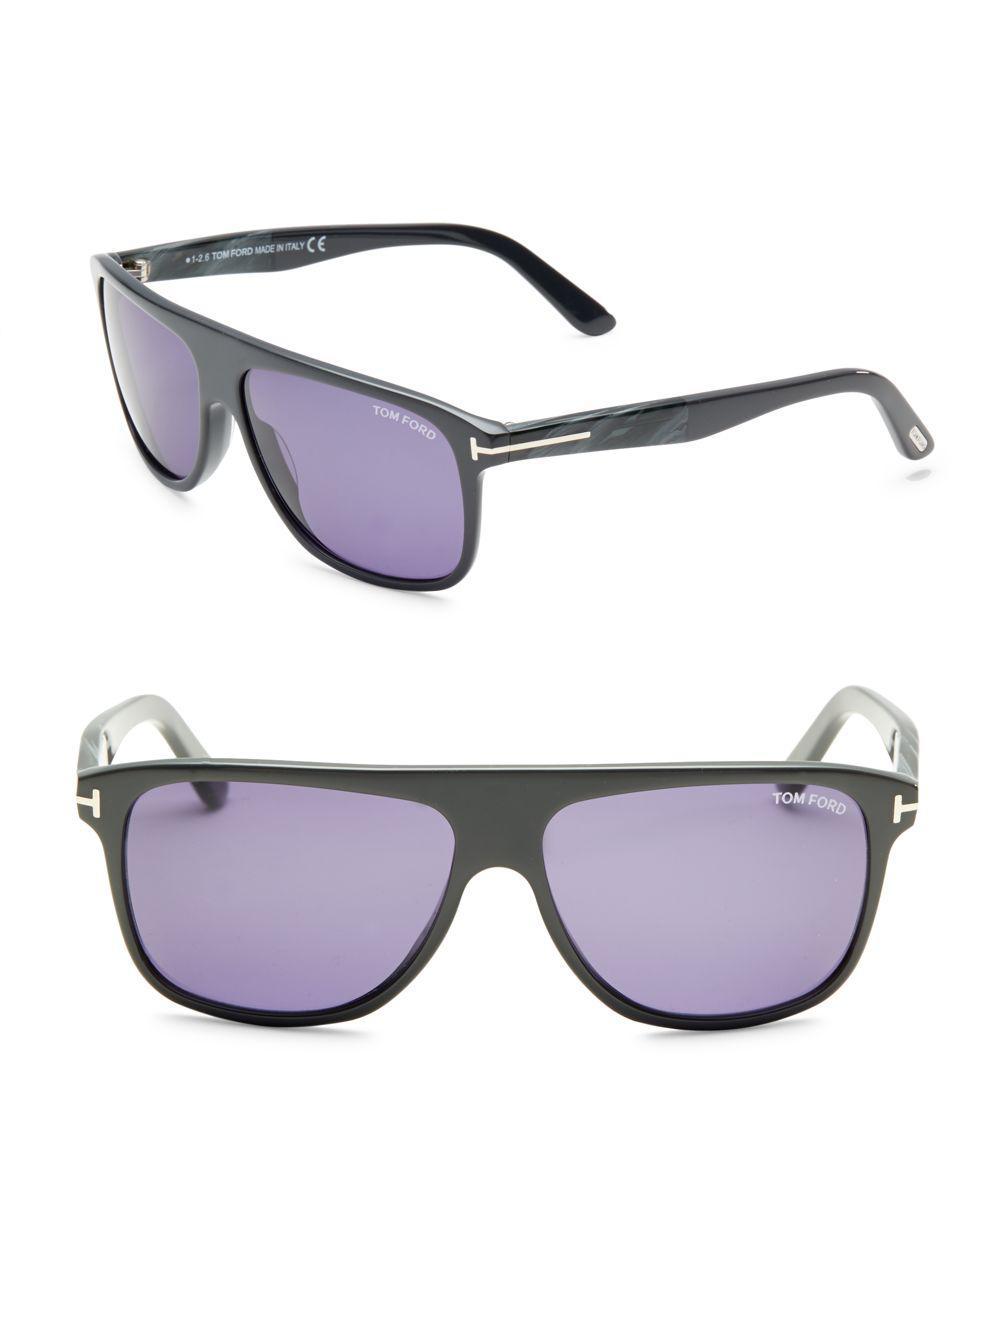 4e24ba79f9 Lyst - Oliver Peoples Dore 51mm Cat Eye Sunglasses in Black for Men